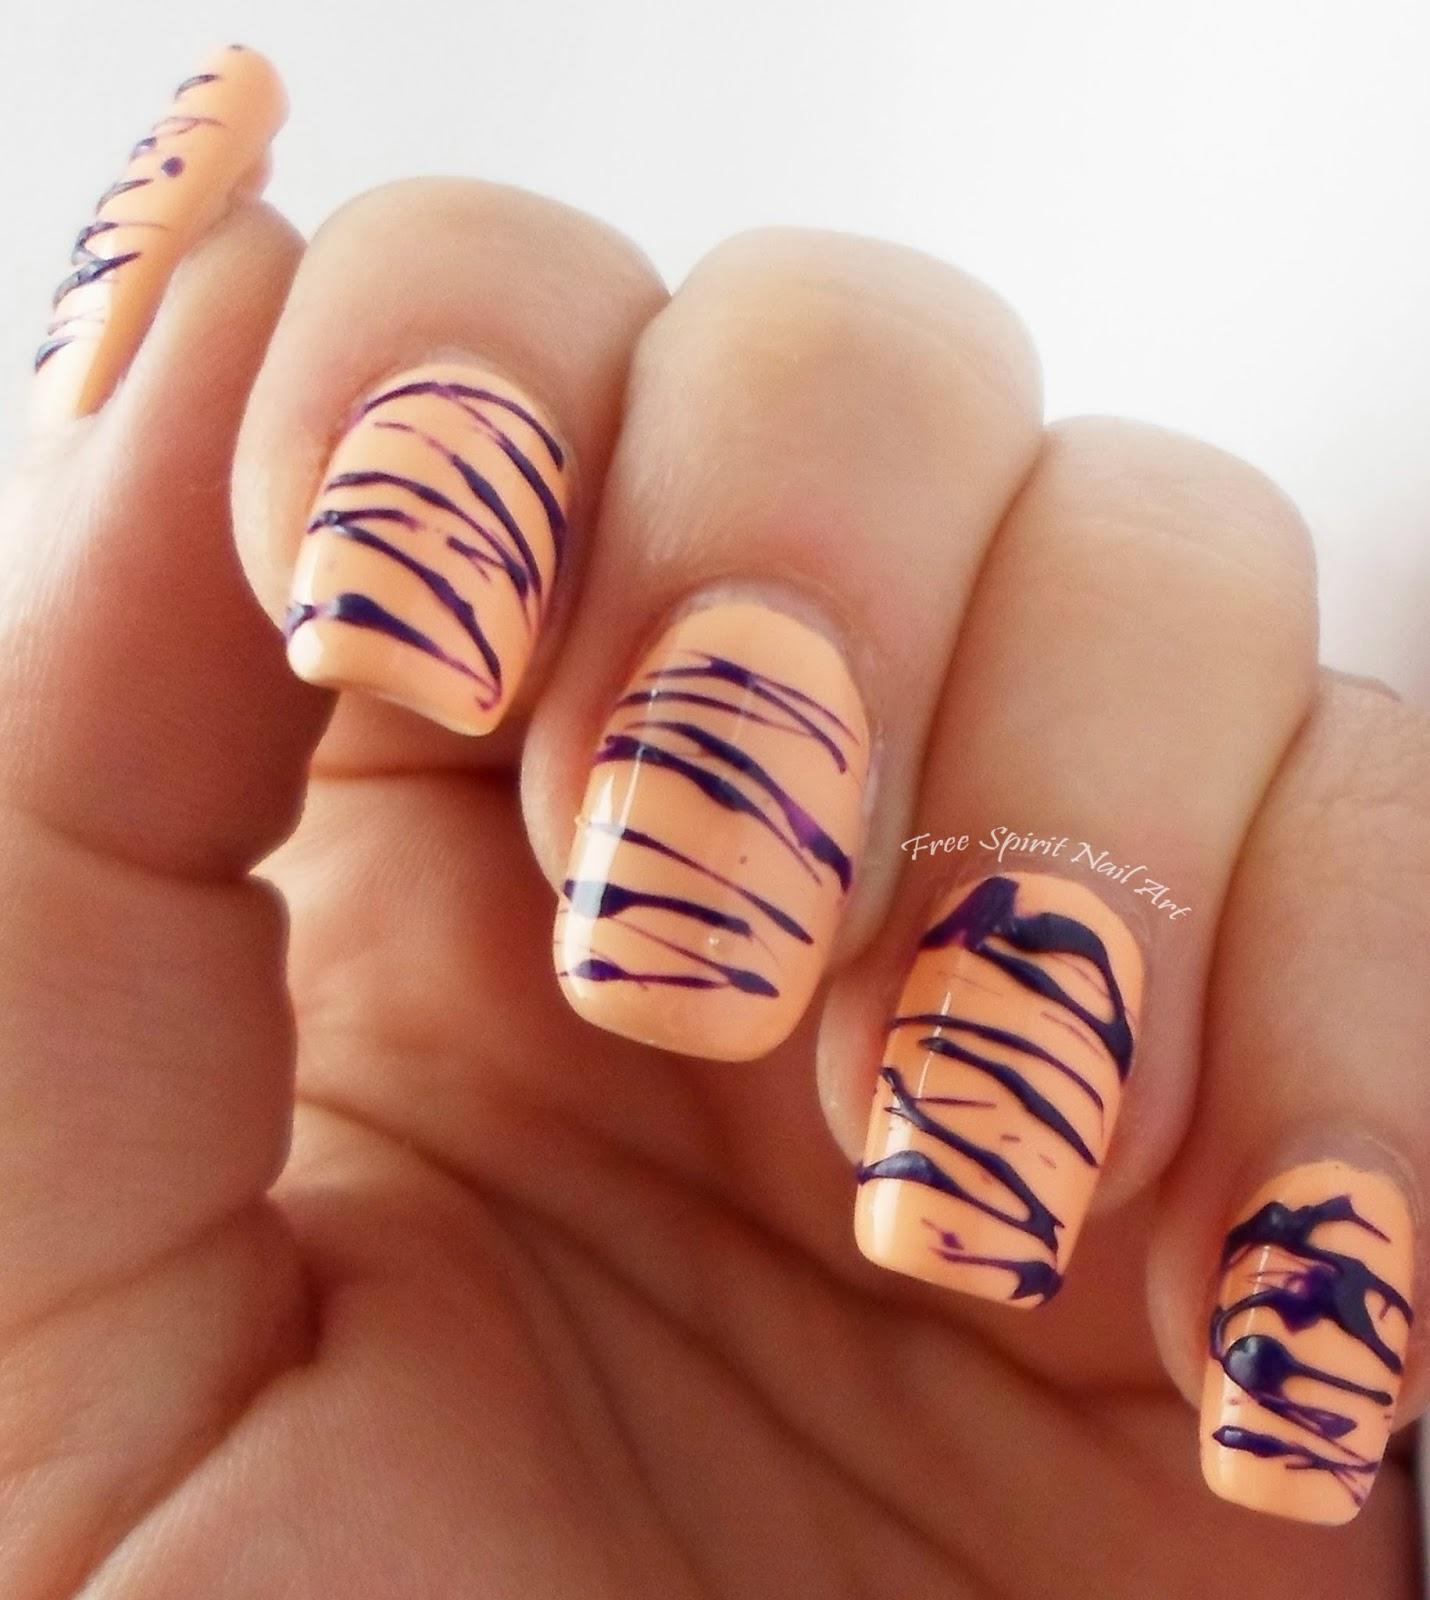 Free Spirit Nail Art Spun Sugar Mani Nail Art And A Quick Review